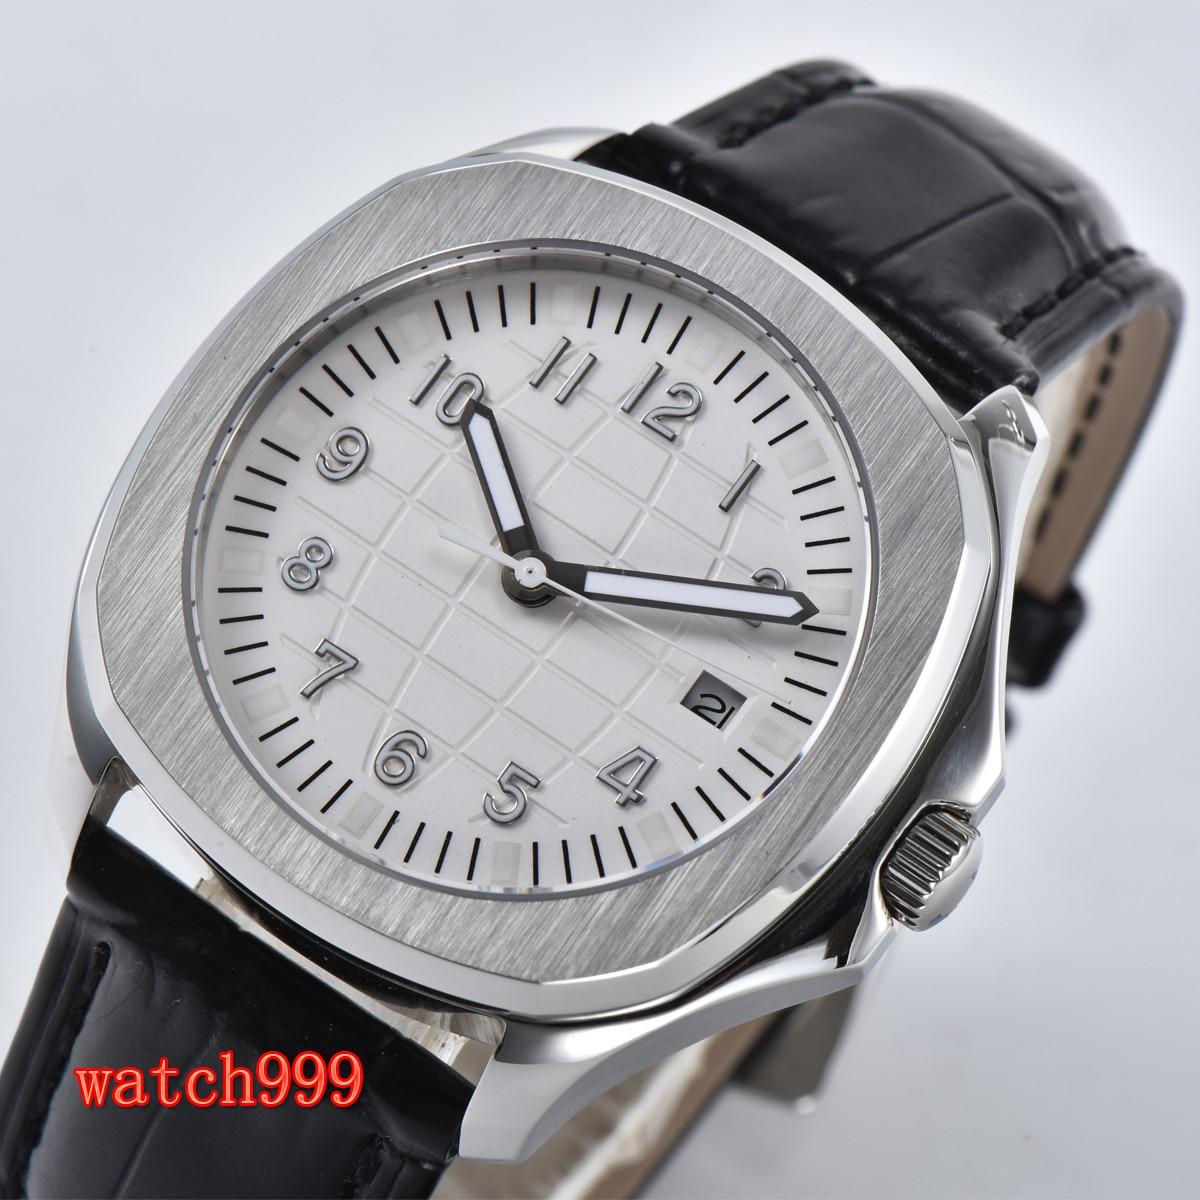 BLIGER 40mm sapphire glass white dial date automatic men's fashion watch black belt waterproof mechanical watch